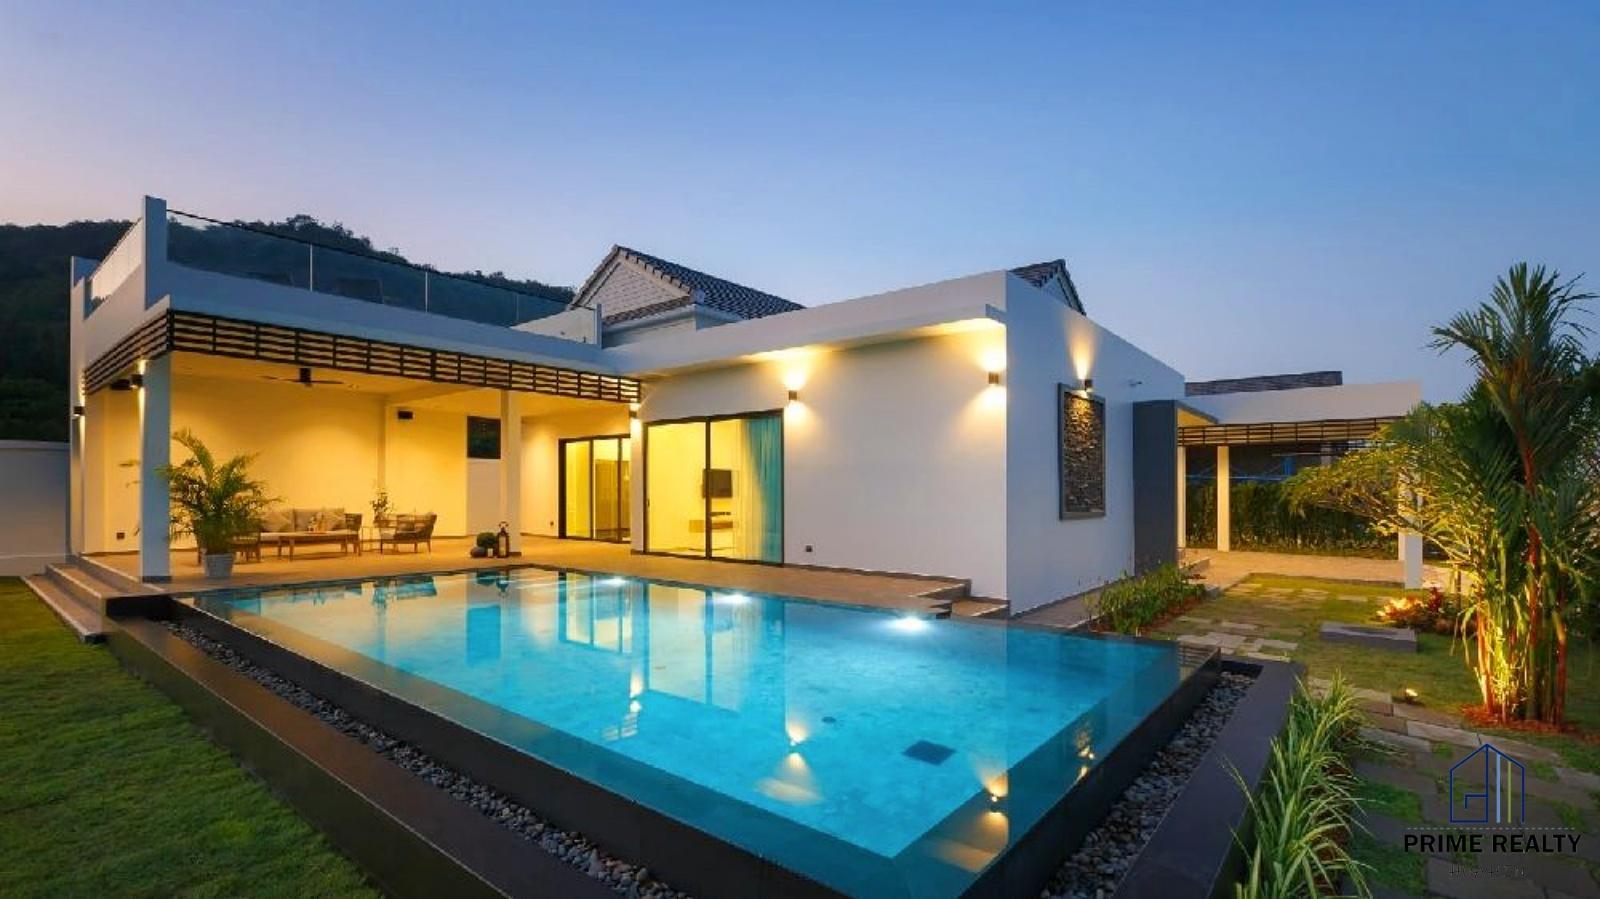 Modern Luxury Pool Villa ขายบ้านหรูพร้อมบริการแบบโรงแรม